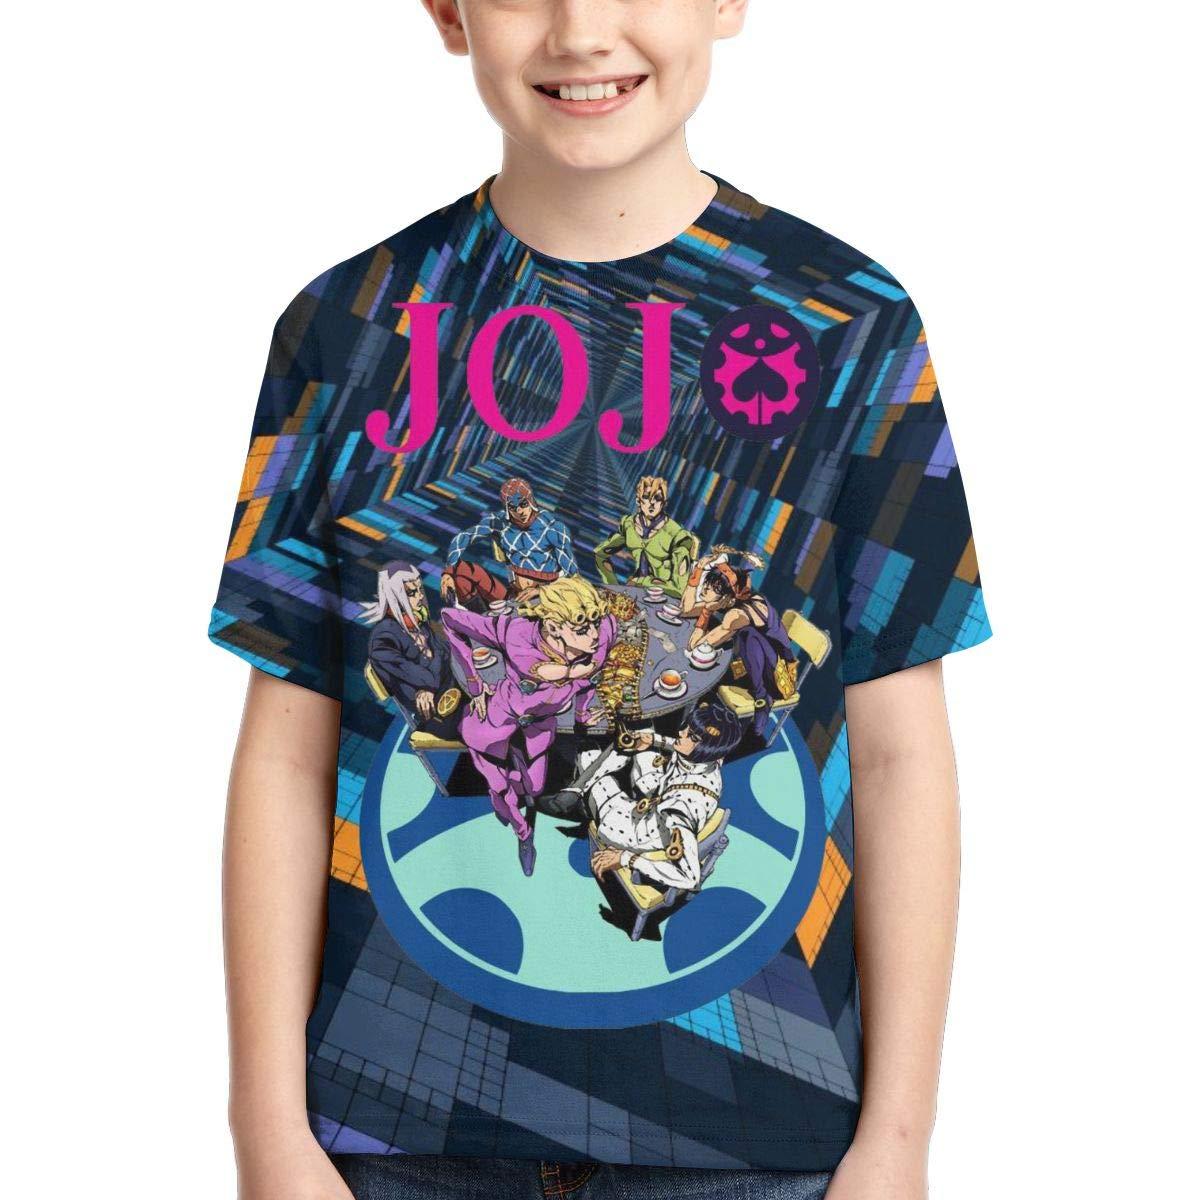 Zengqinglove Boys,Girls,Youth JoJos Bizarre Adventure Tee Shirt